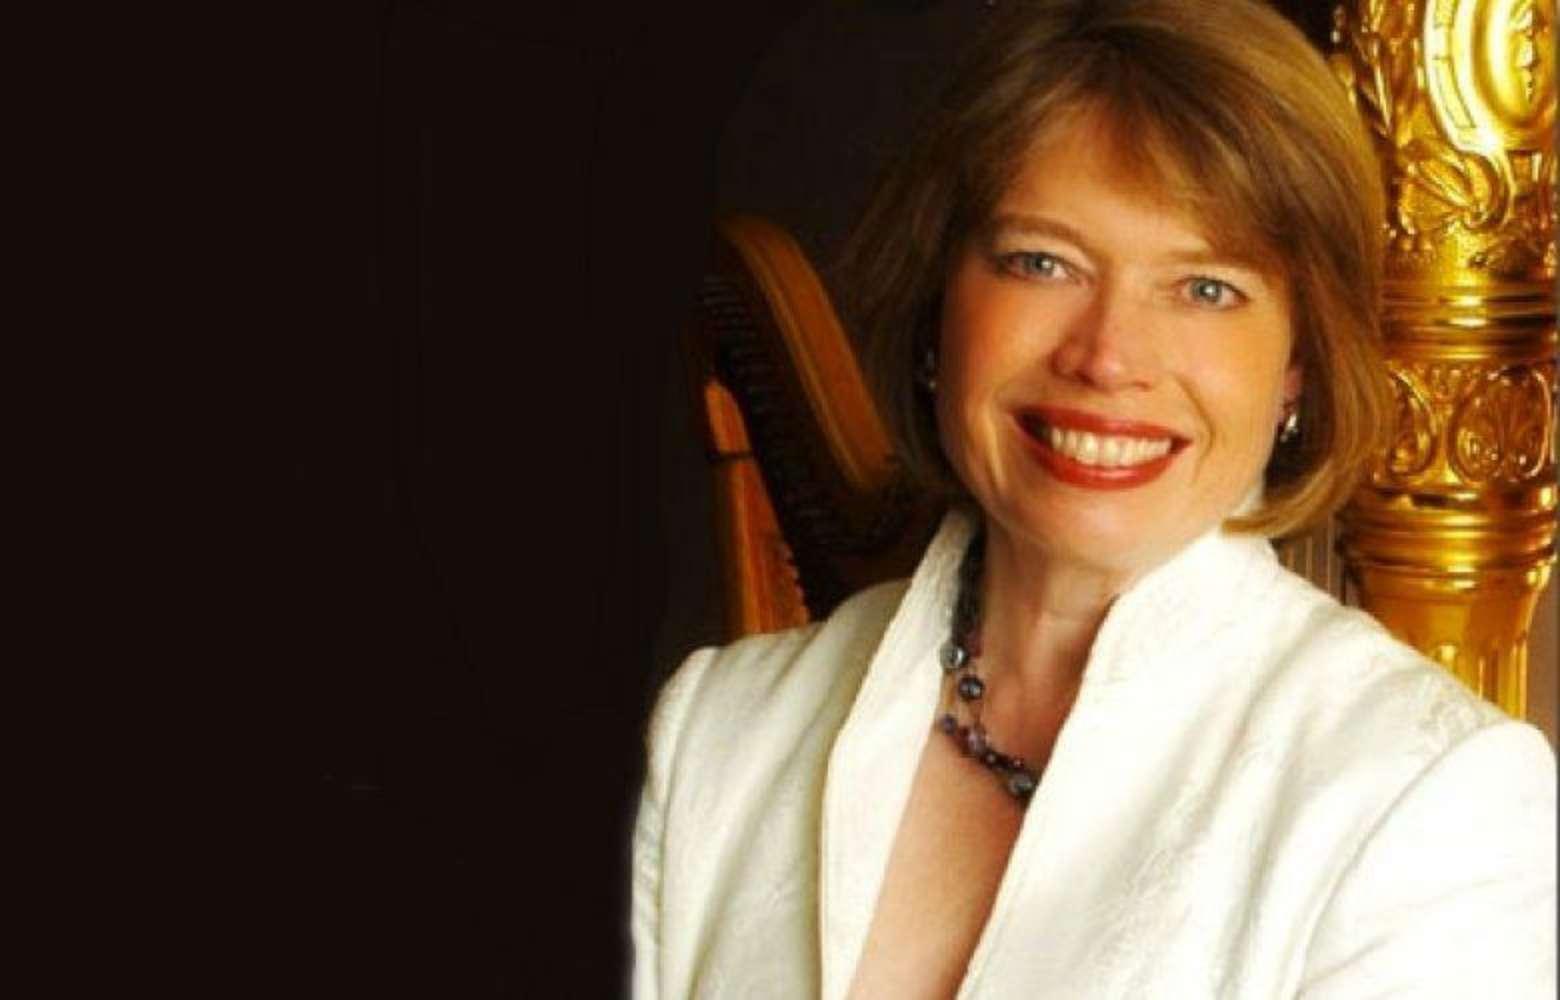 Cathy Mainnew